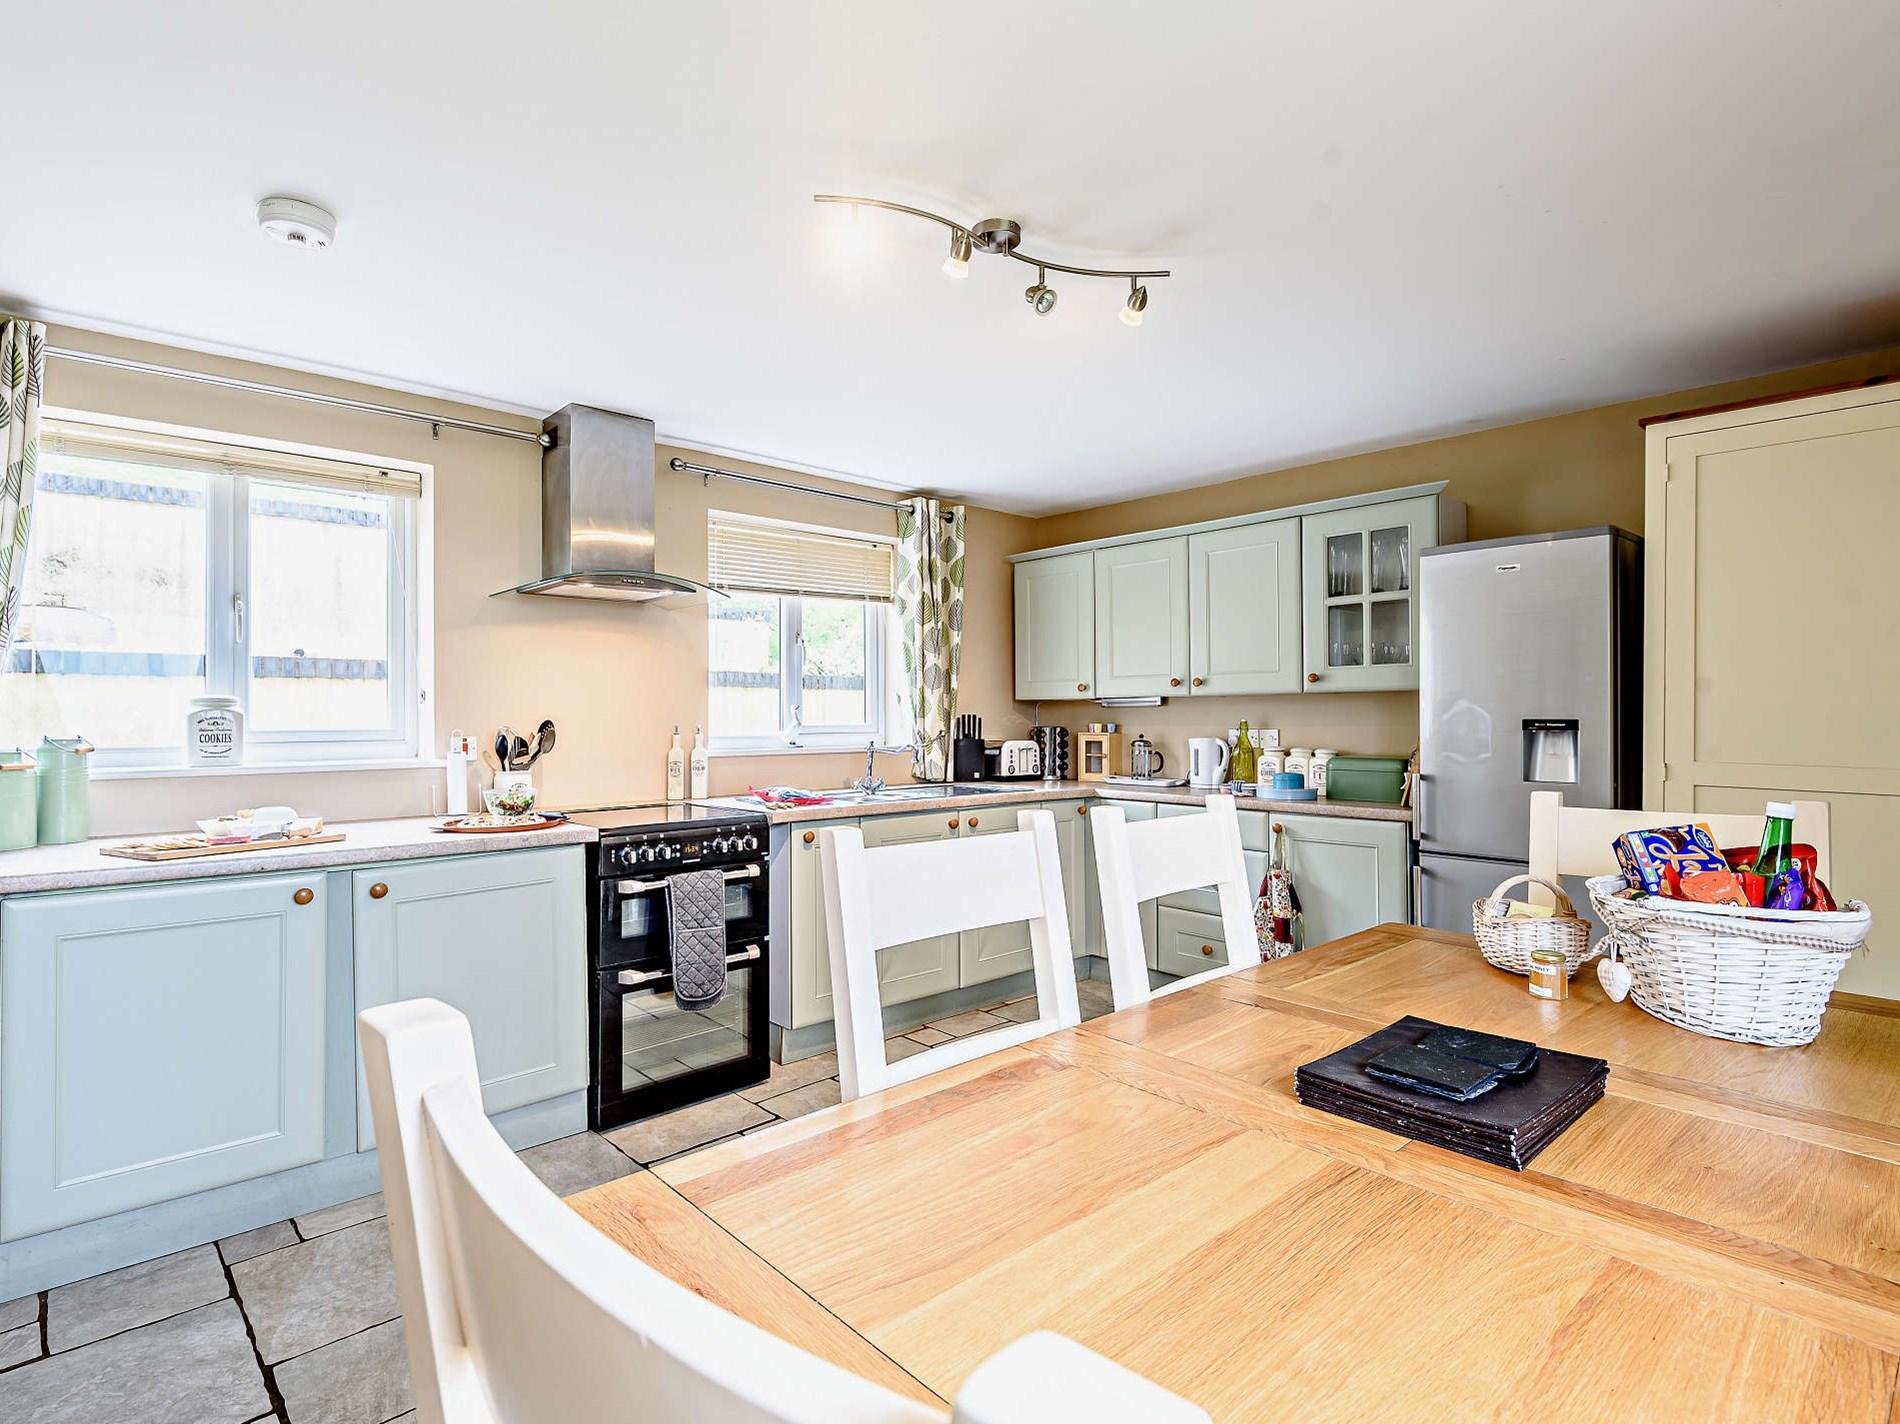 3 Bedroom Cottage in Ludlow, Heart of England